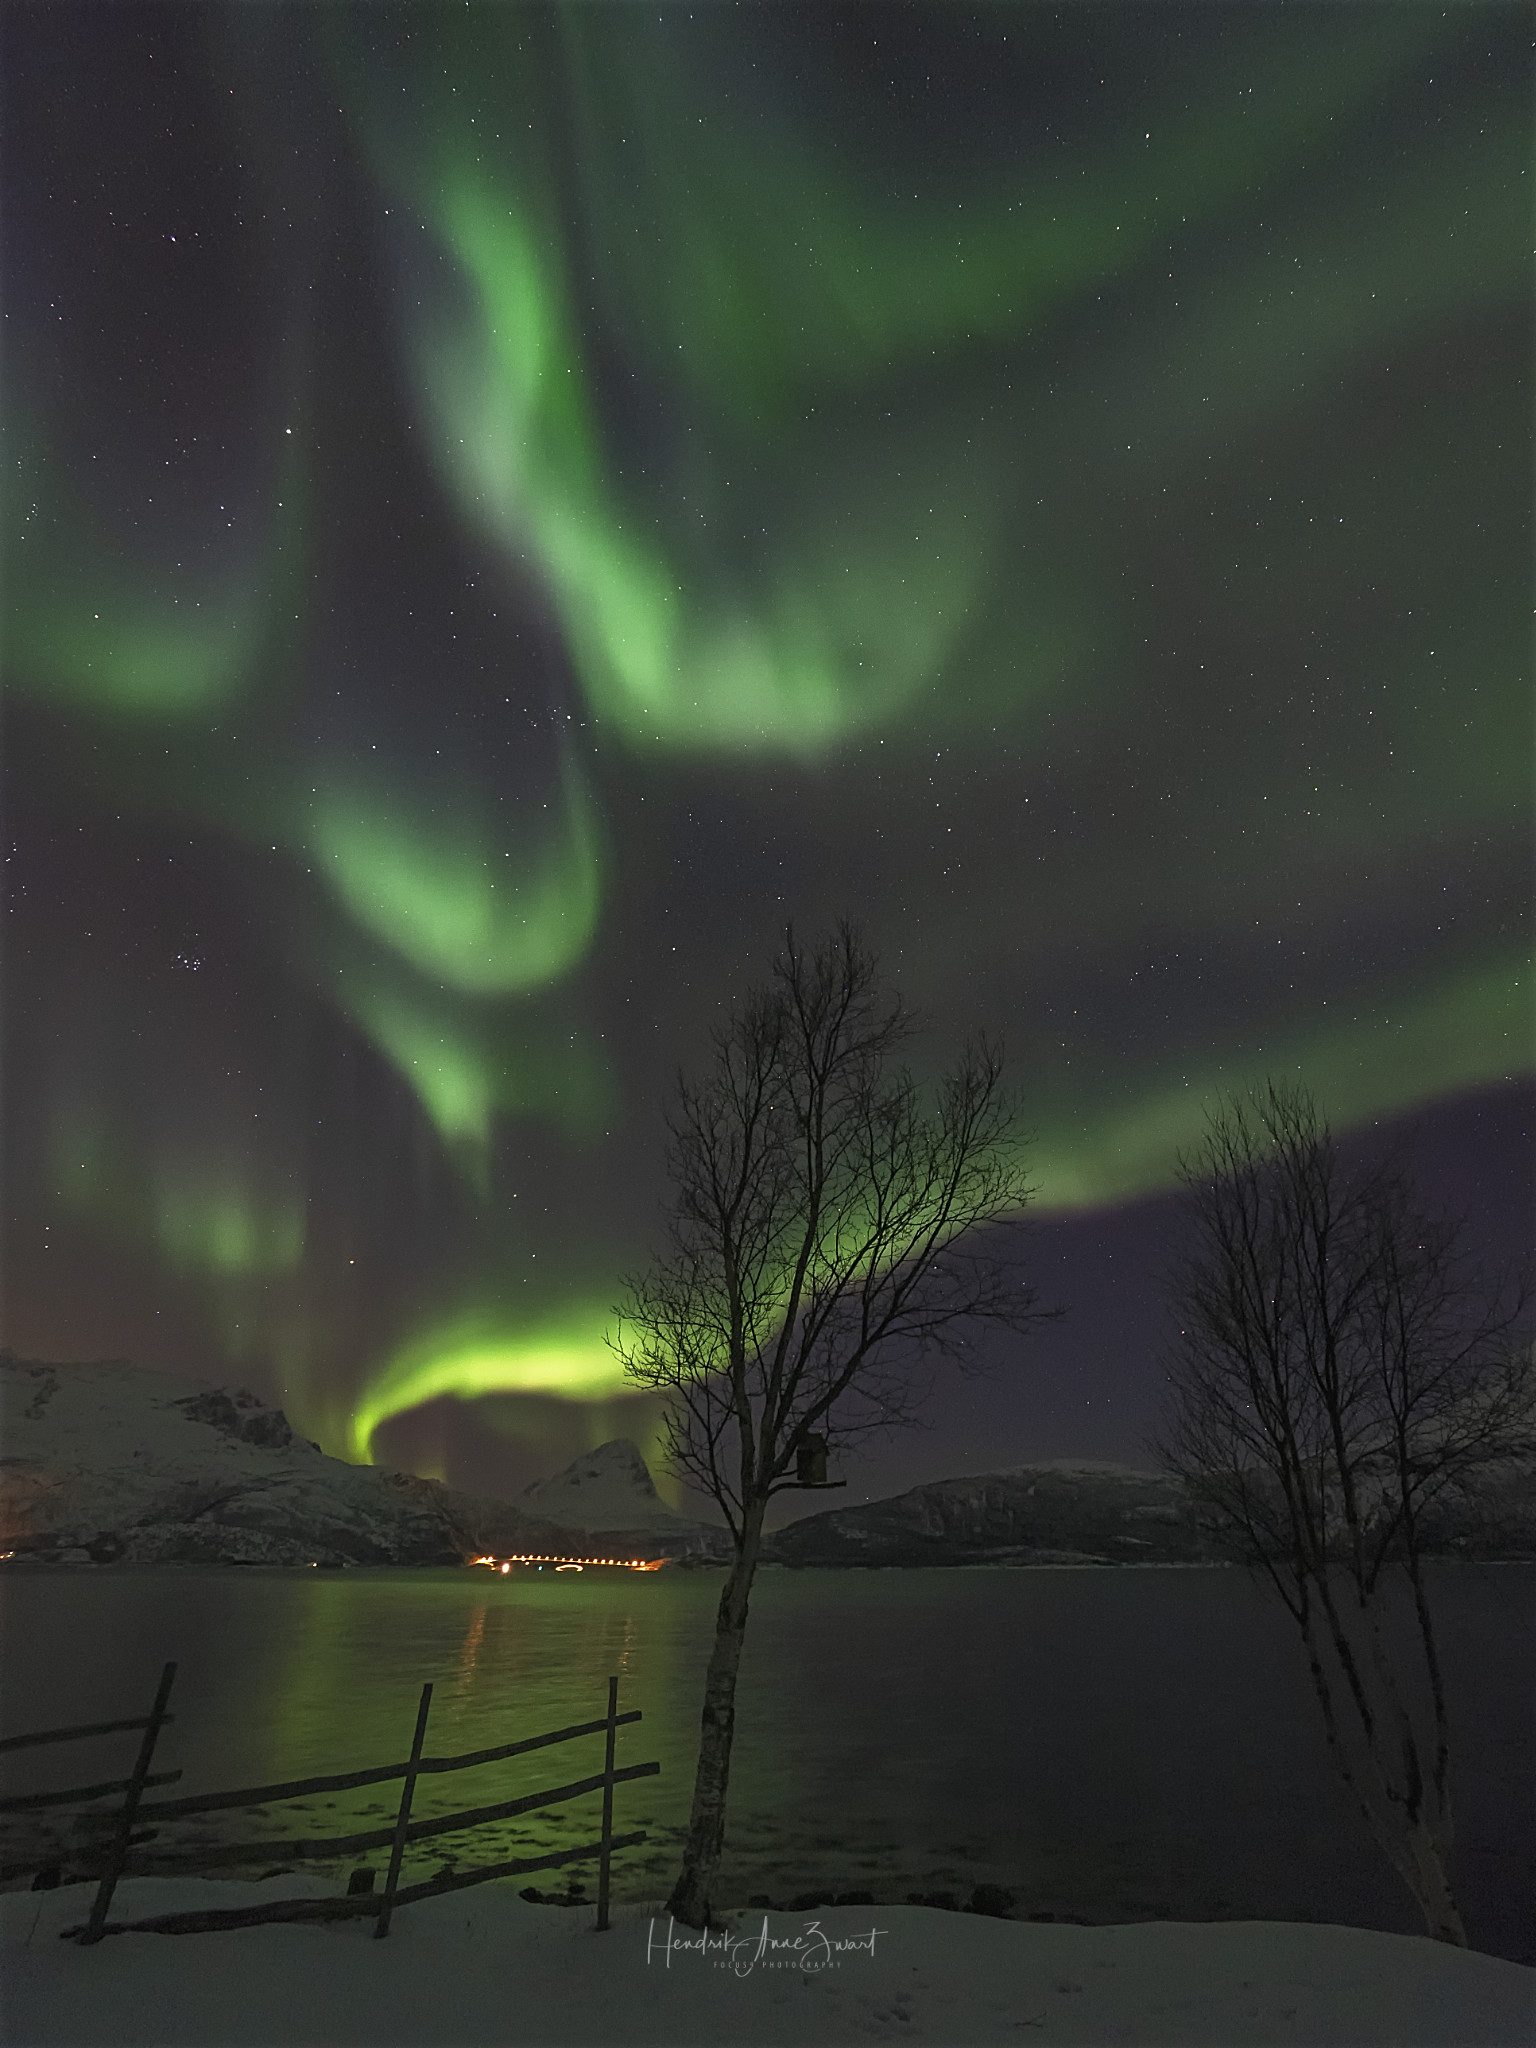 Nordic_Light_Northern_Lights_Sjovegan_6.jpg